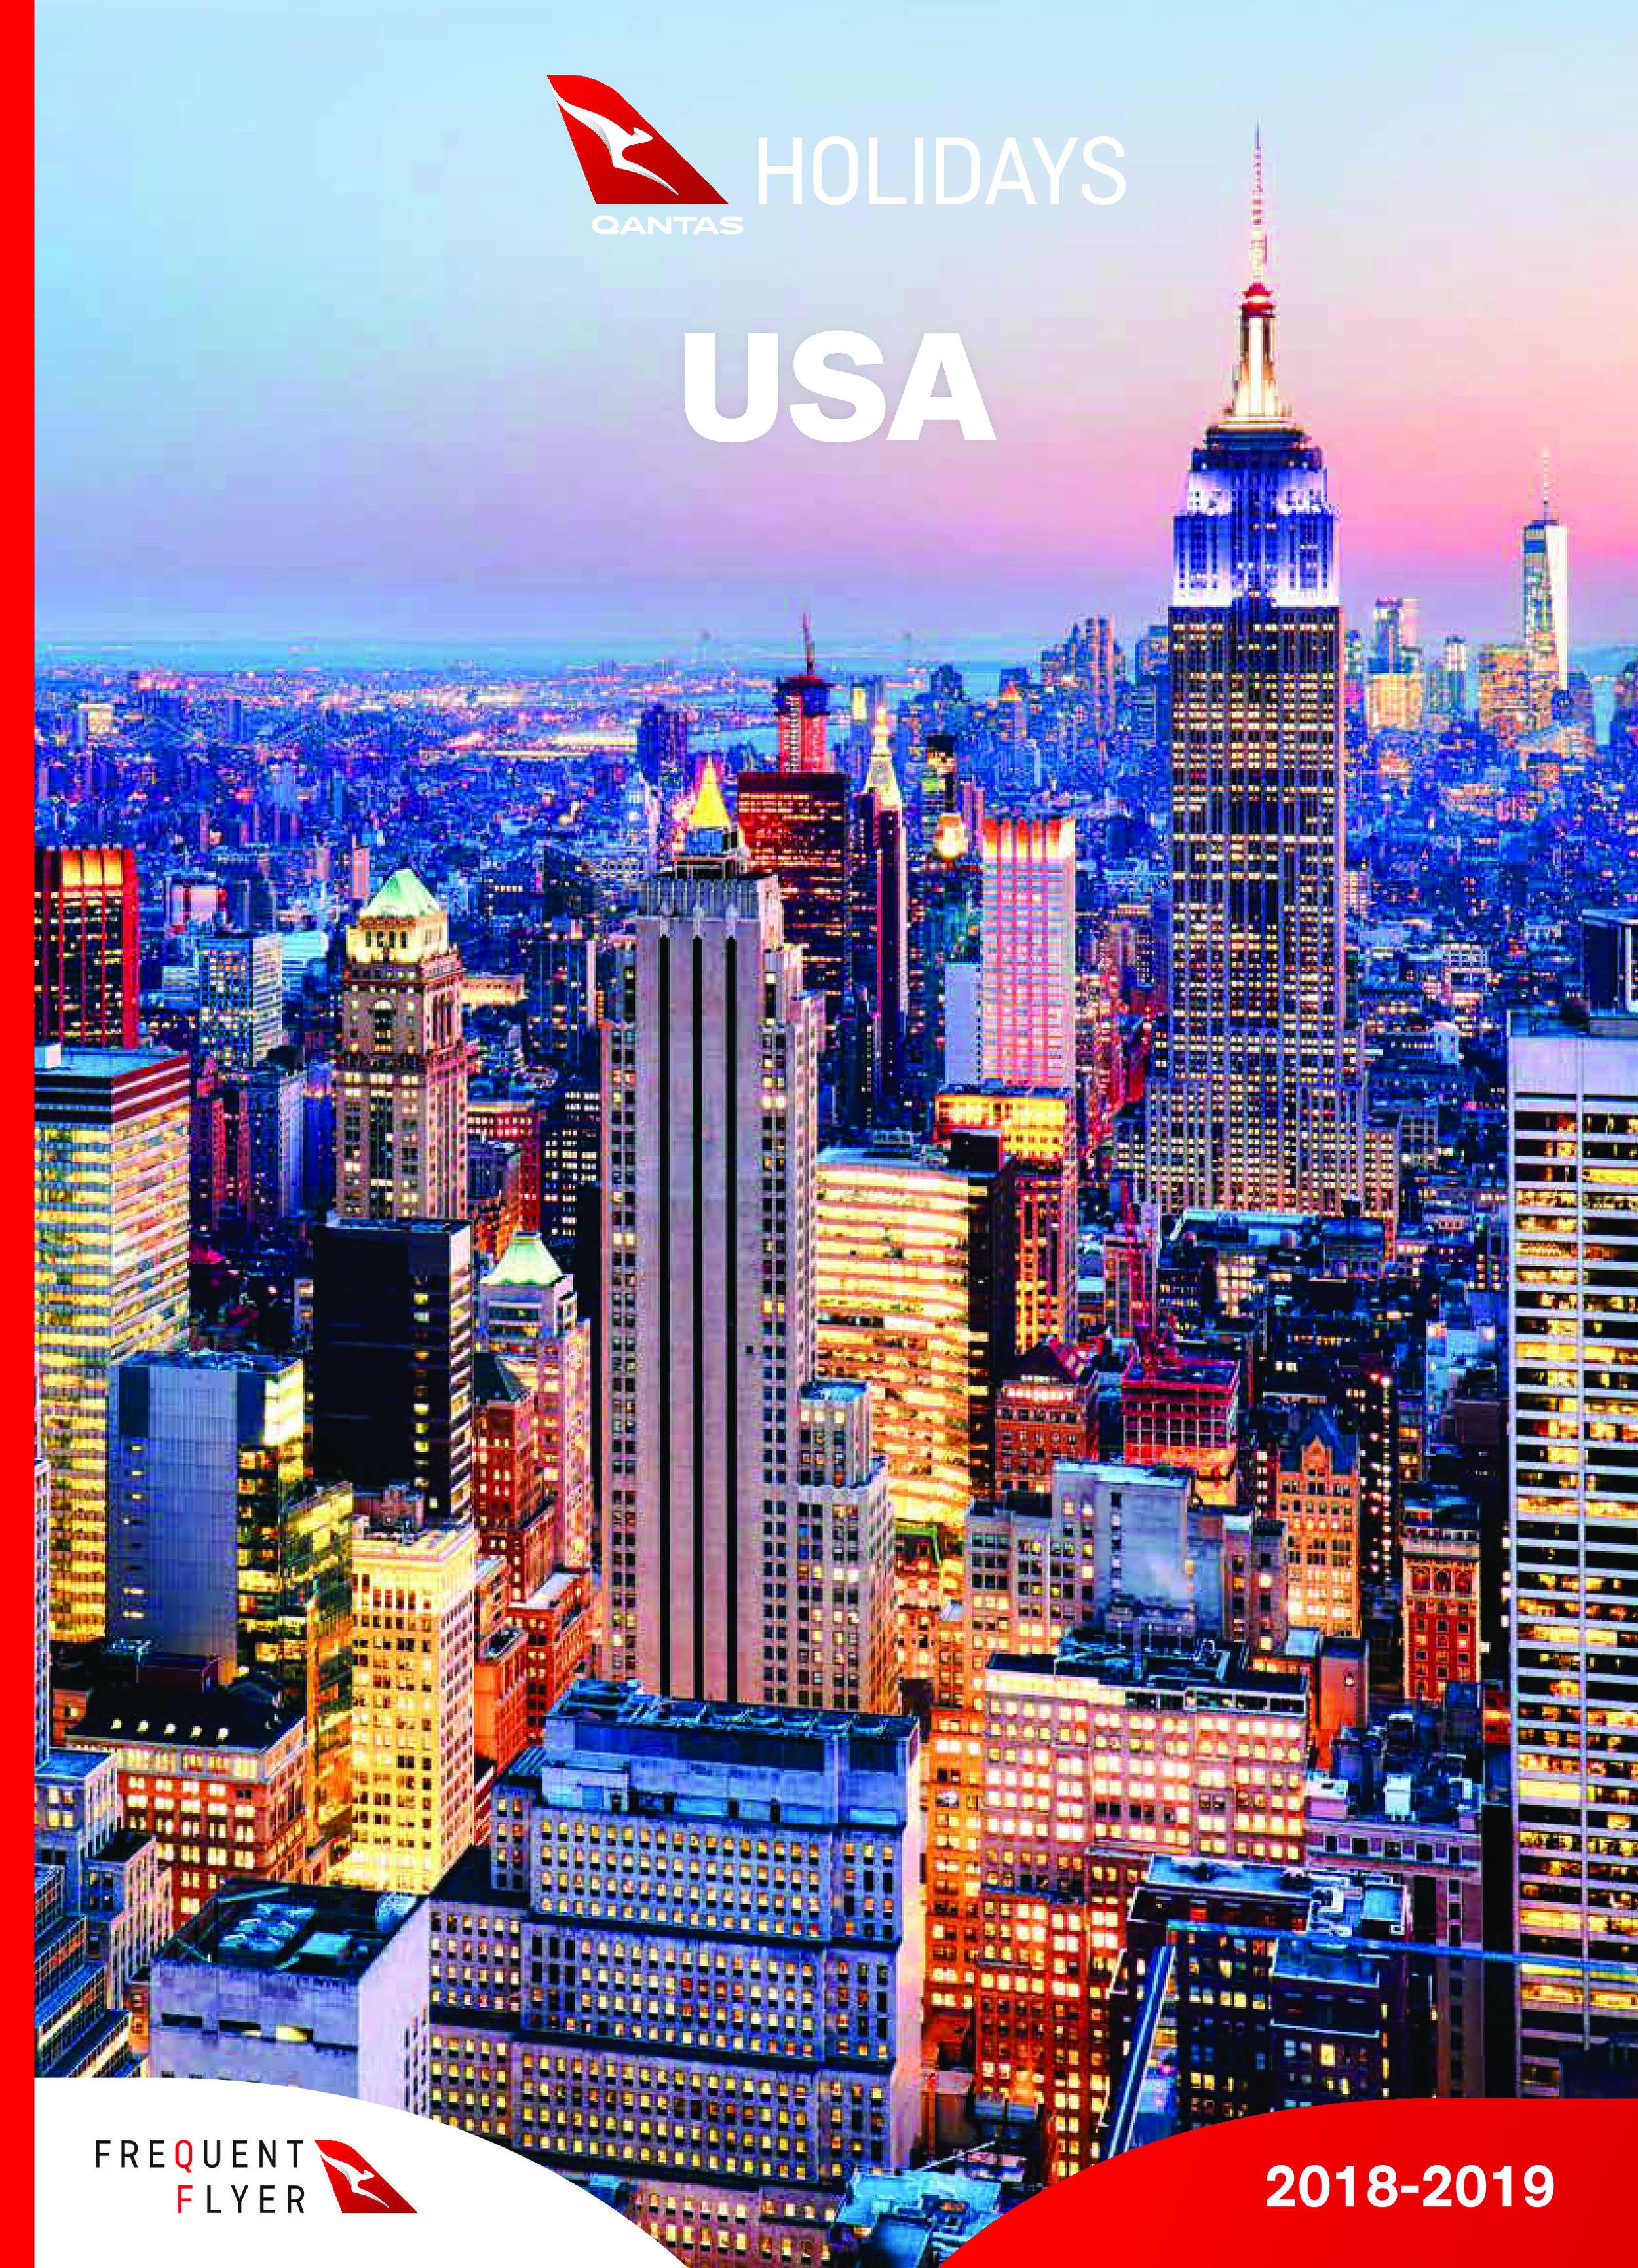 USA-page-0.jpg